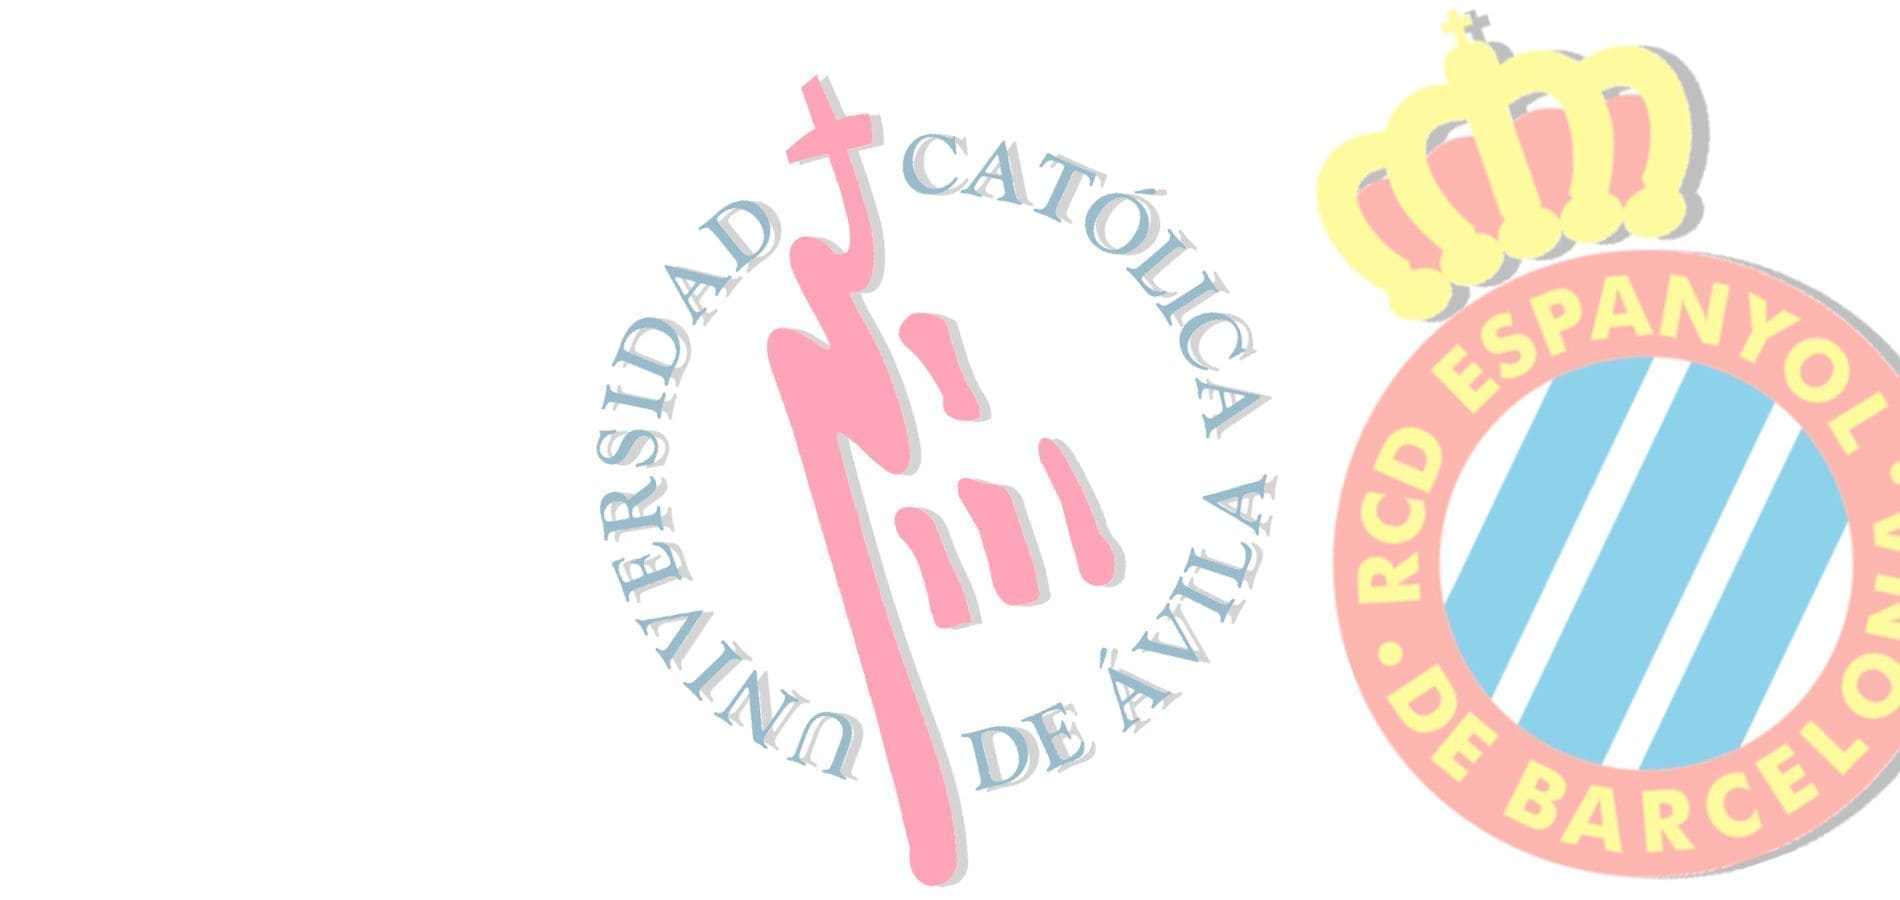 UCAV & Escola RCDE logos